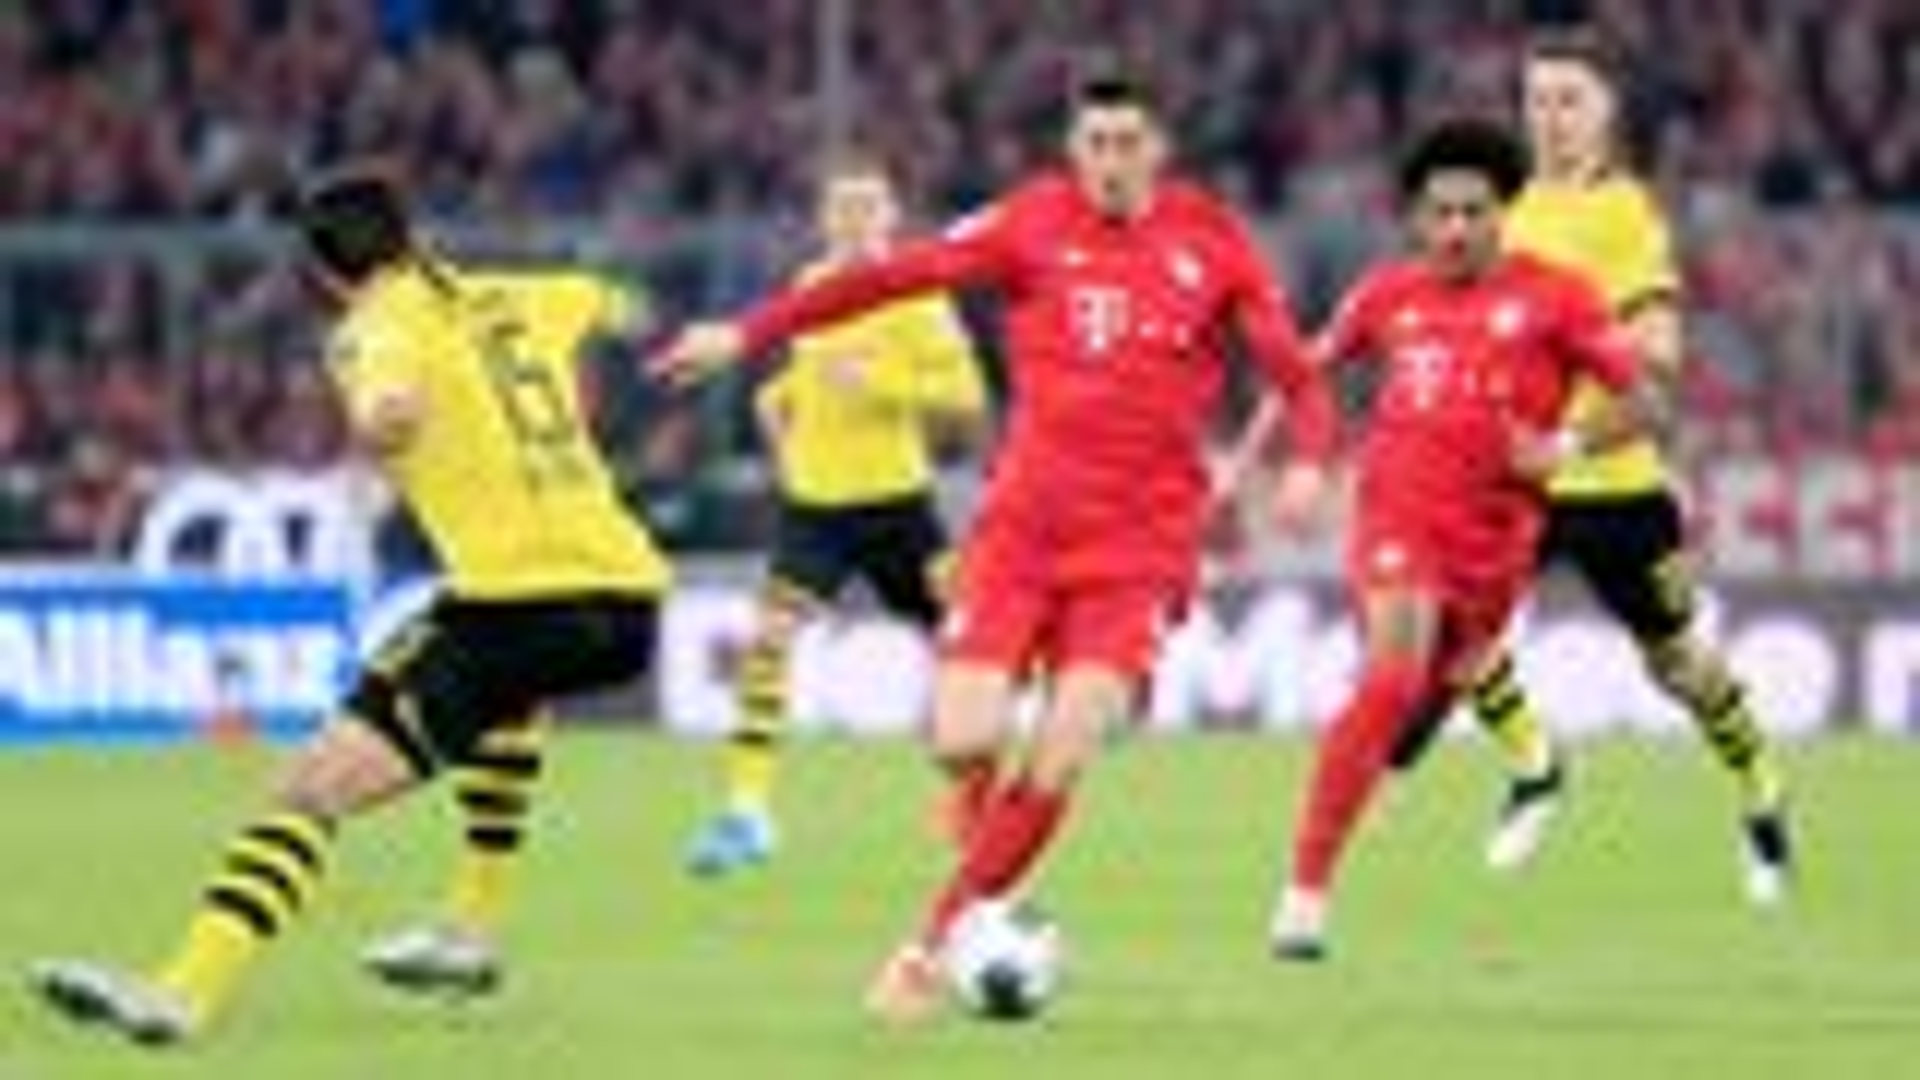 Klare Sache im Klassiker: Bayern bezwingt Dortmund